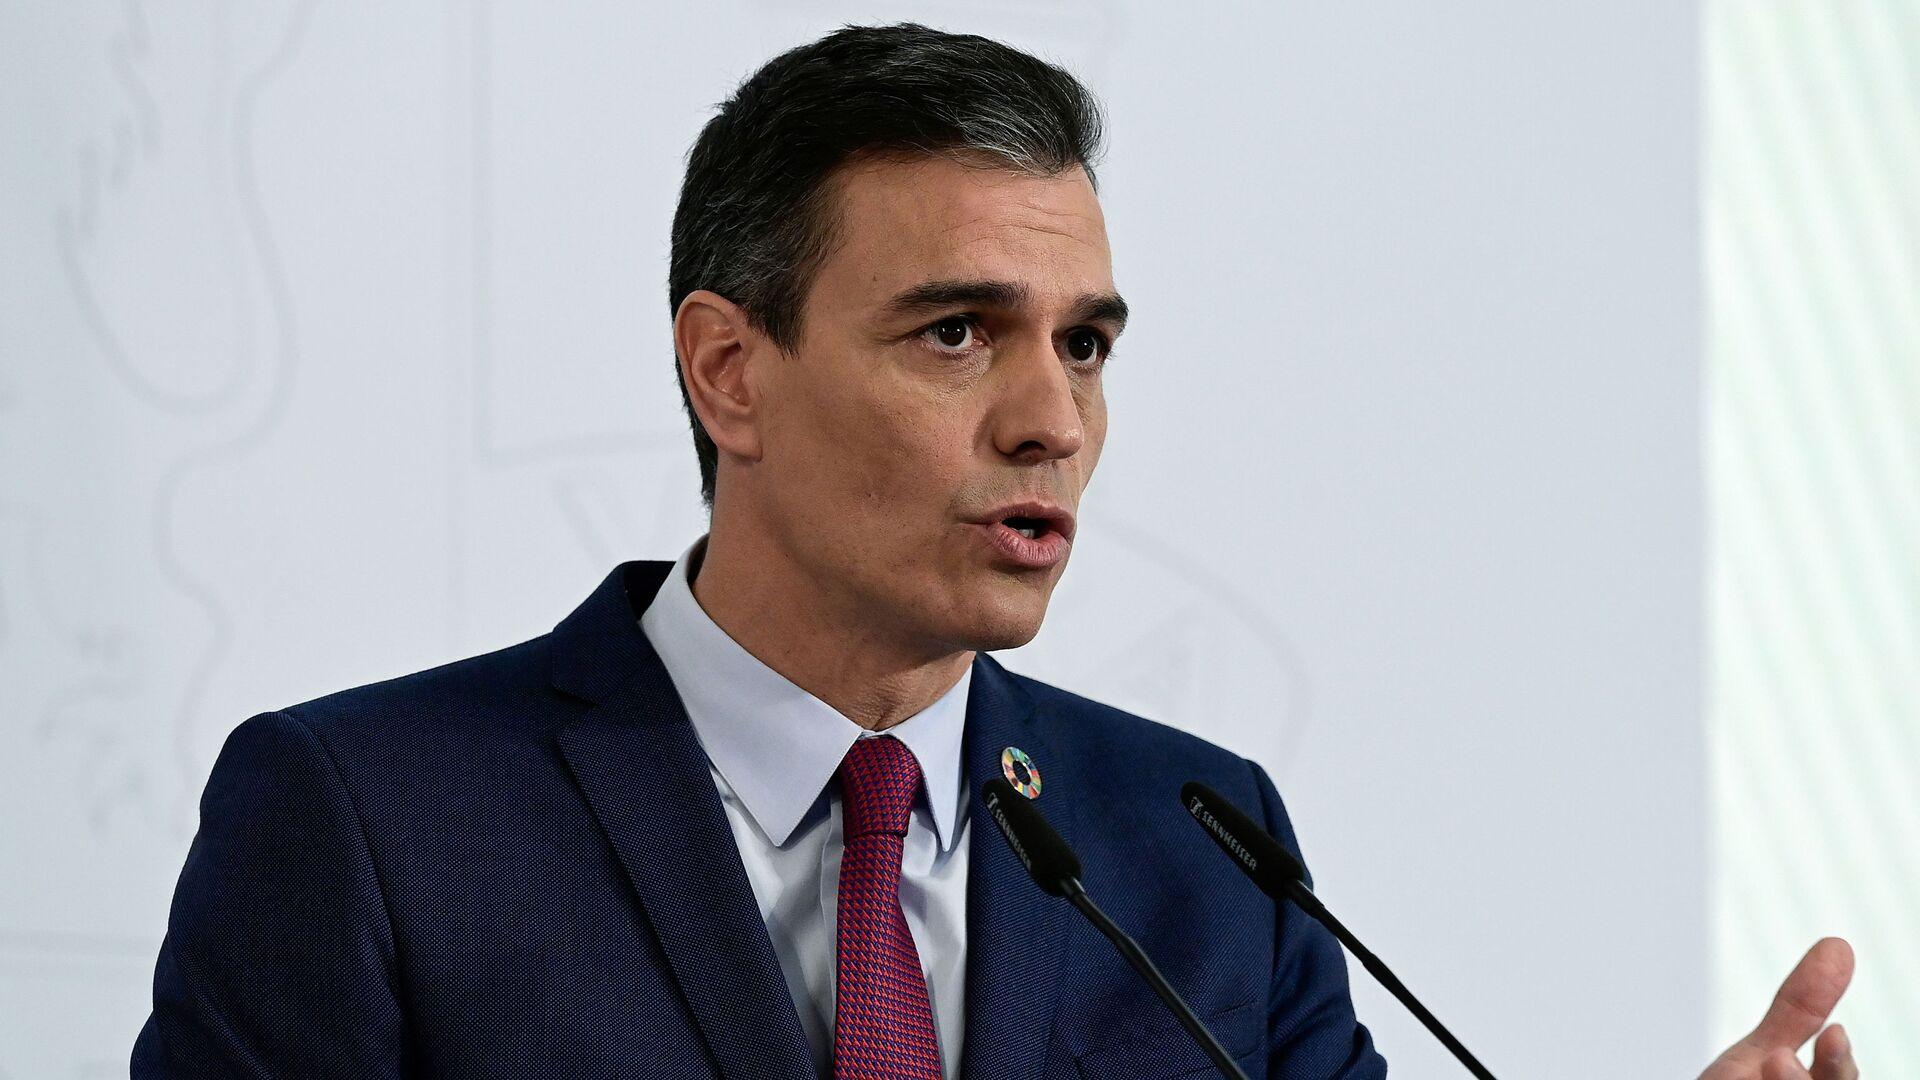 Pedro Sánchez, presidente del Gobierno de España - Sputnik Mundo, 1920, 15.02.2021